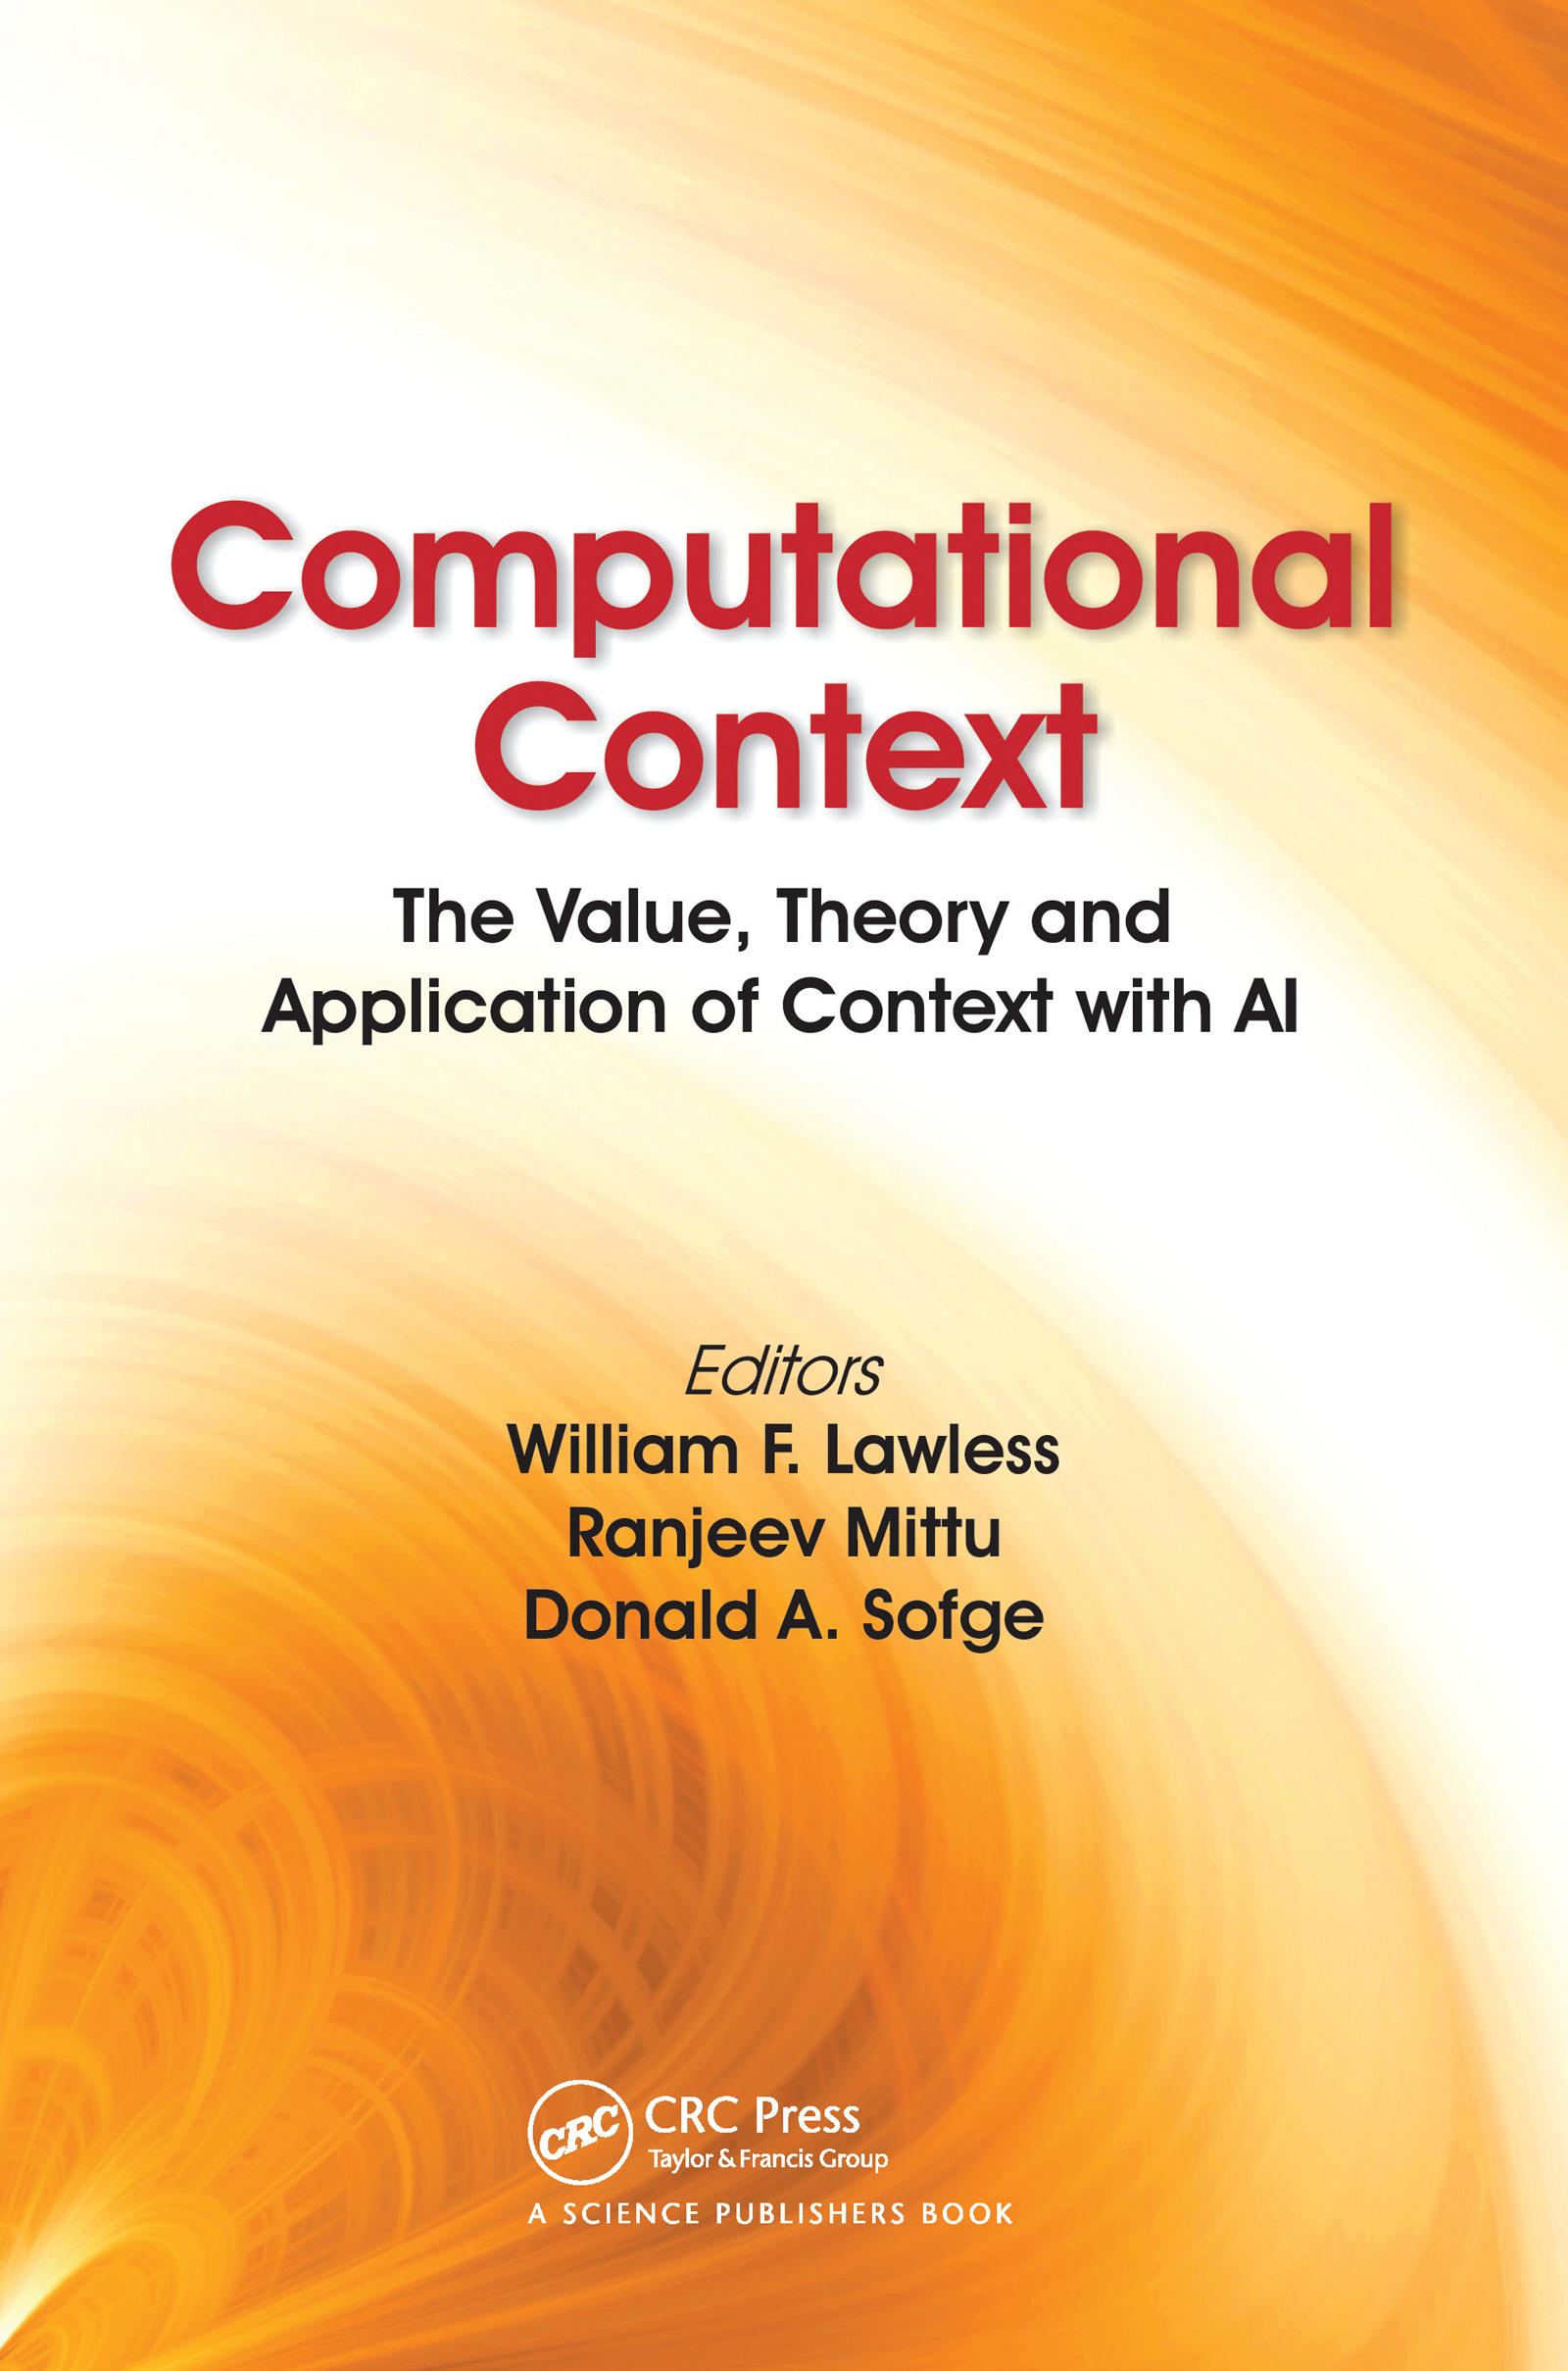 Computational Context